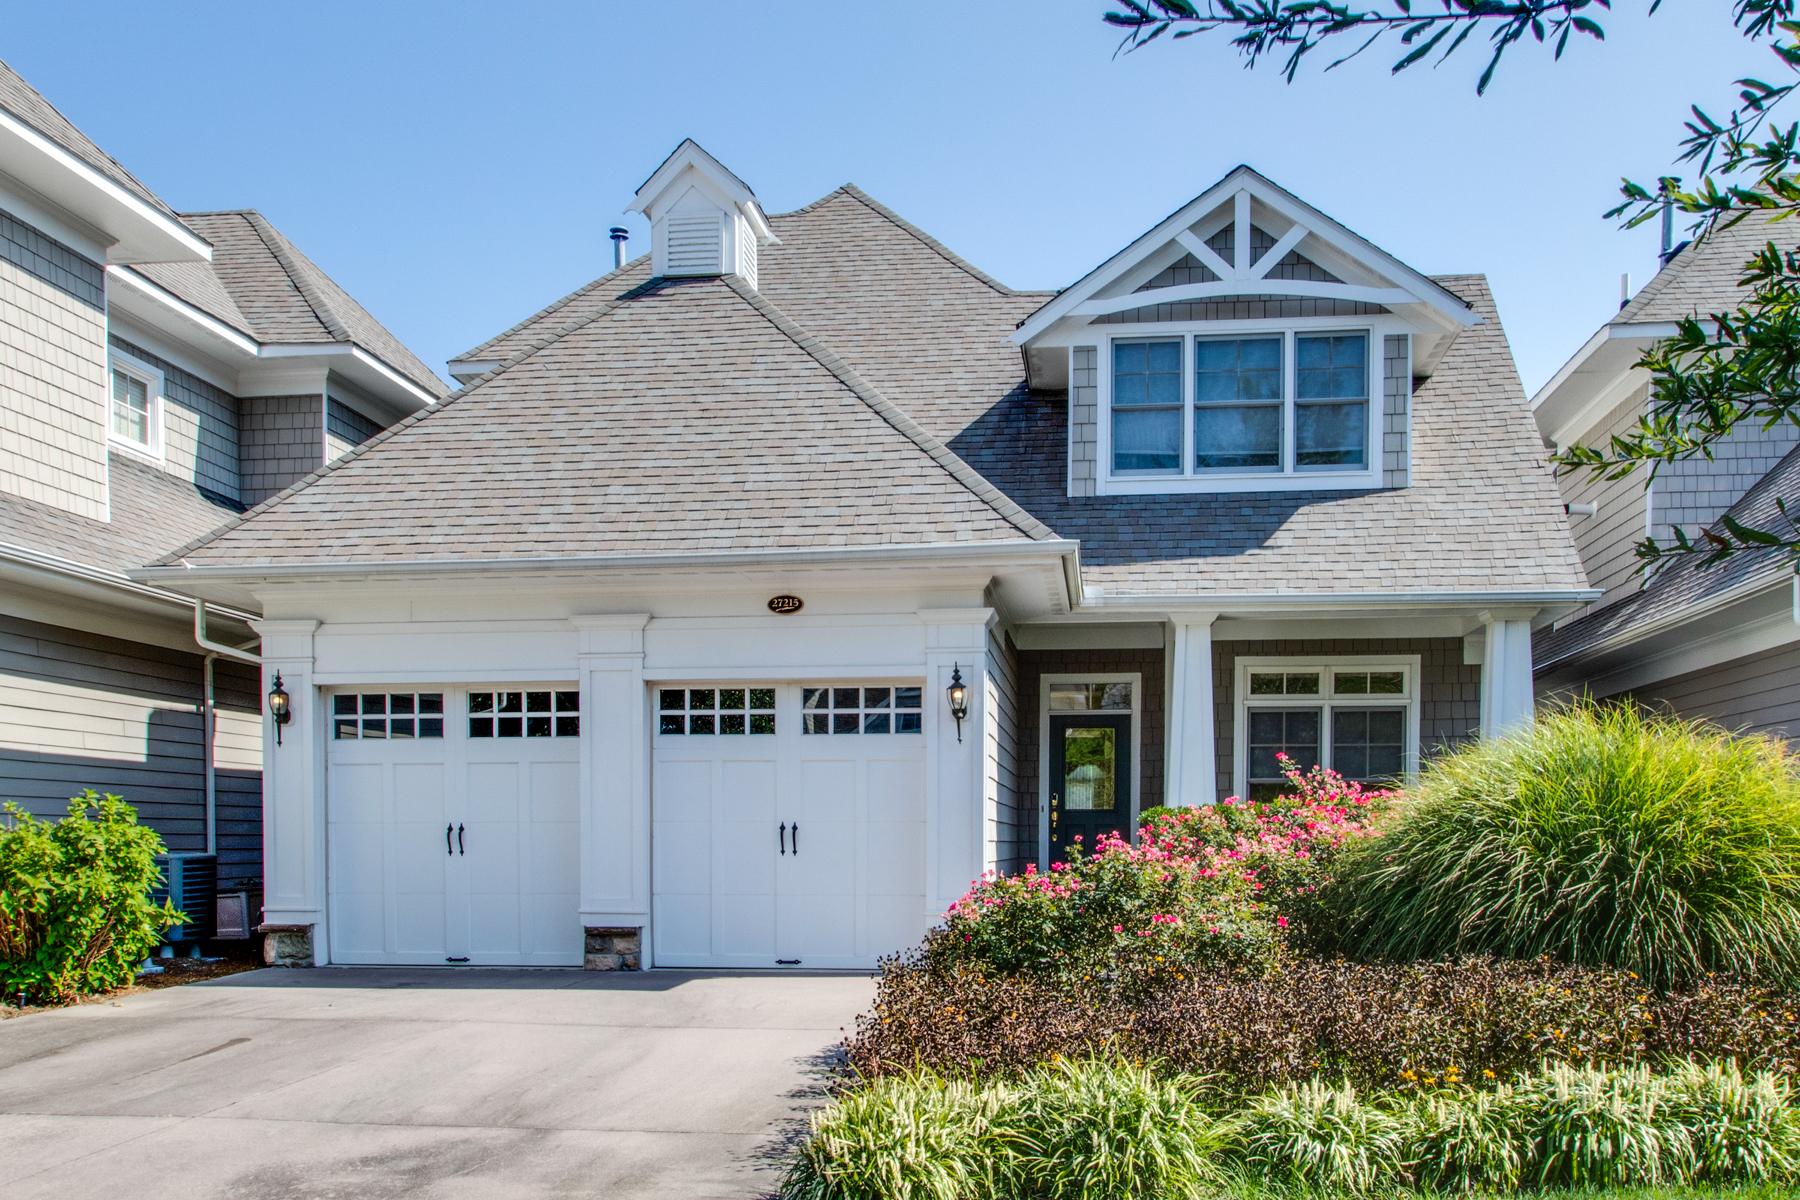 Single Family Homes for Sale at 27215 Barefoot Boulevard , 29 Millsboro, Delaware 19966 United States